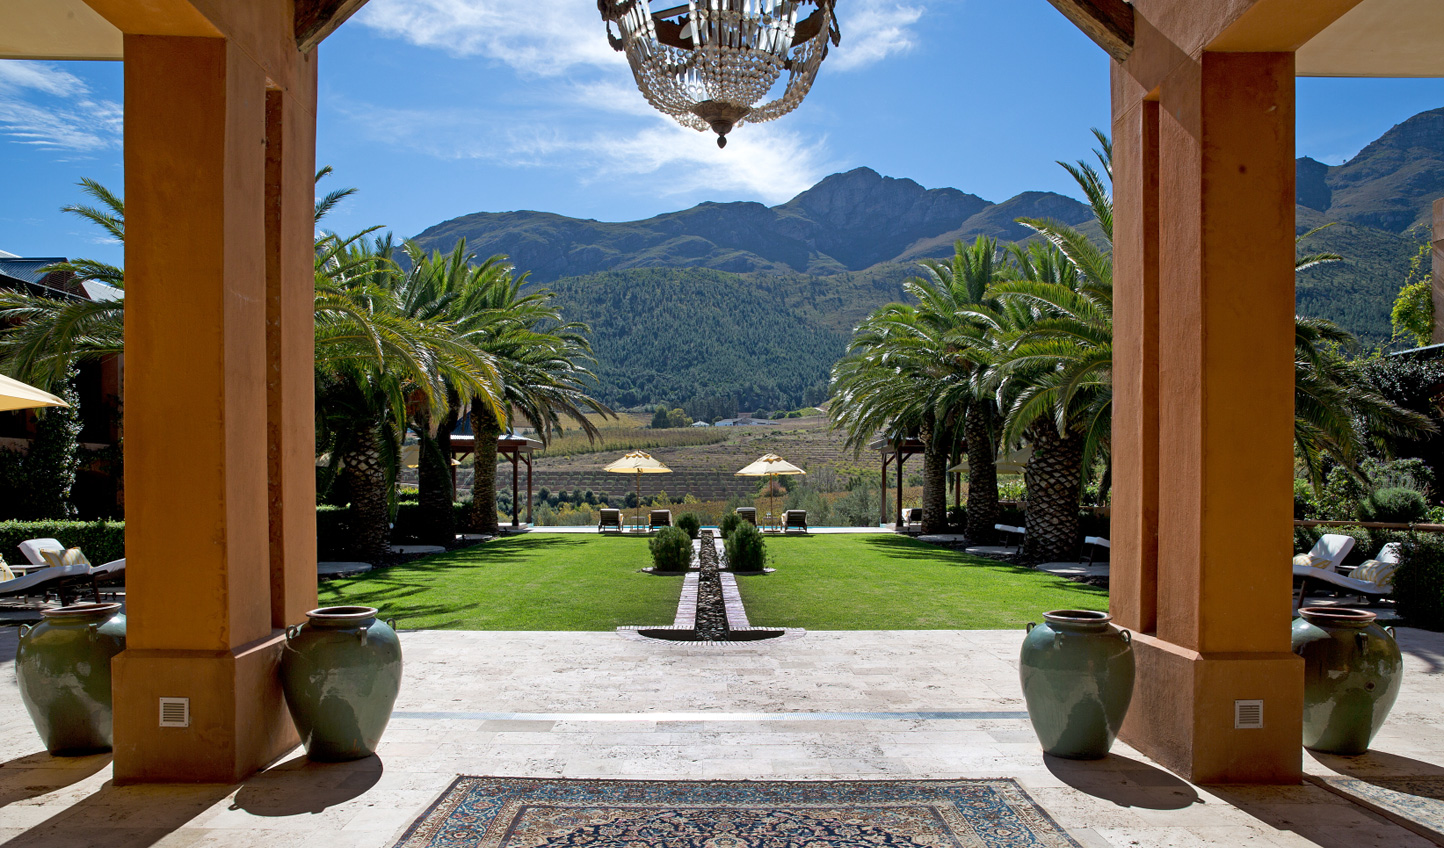 Wander La Residence's beautiful gardens